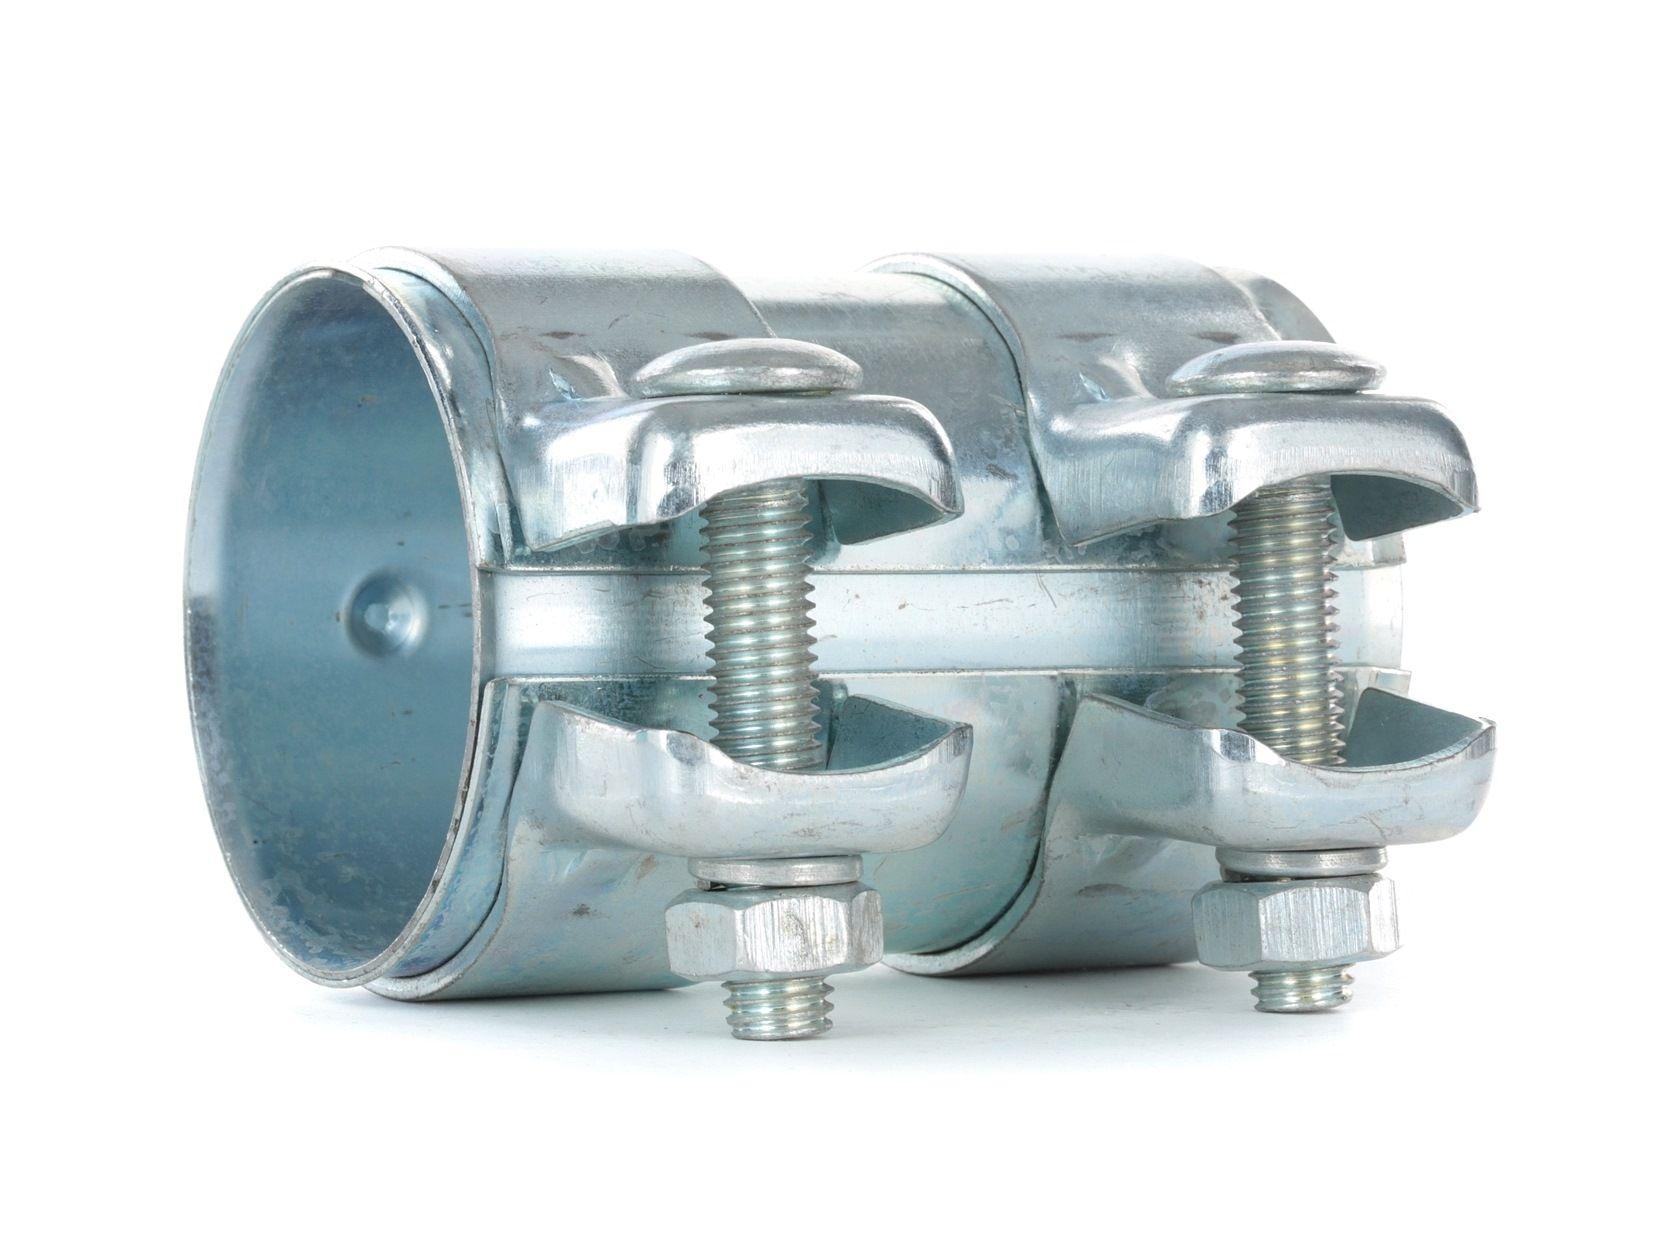 Rohrverbinder, Abgasanlage FA1 114-960 Bewertung